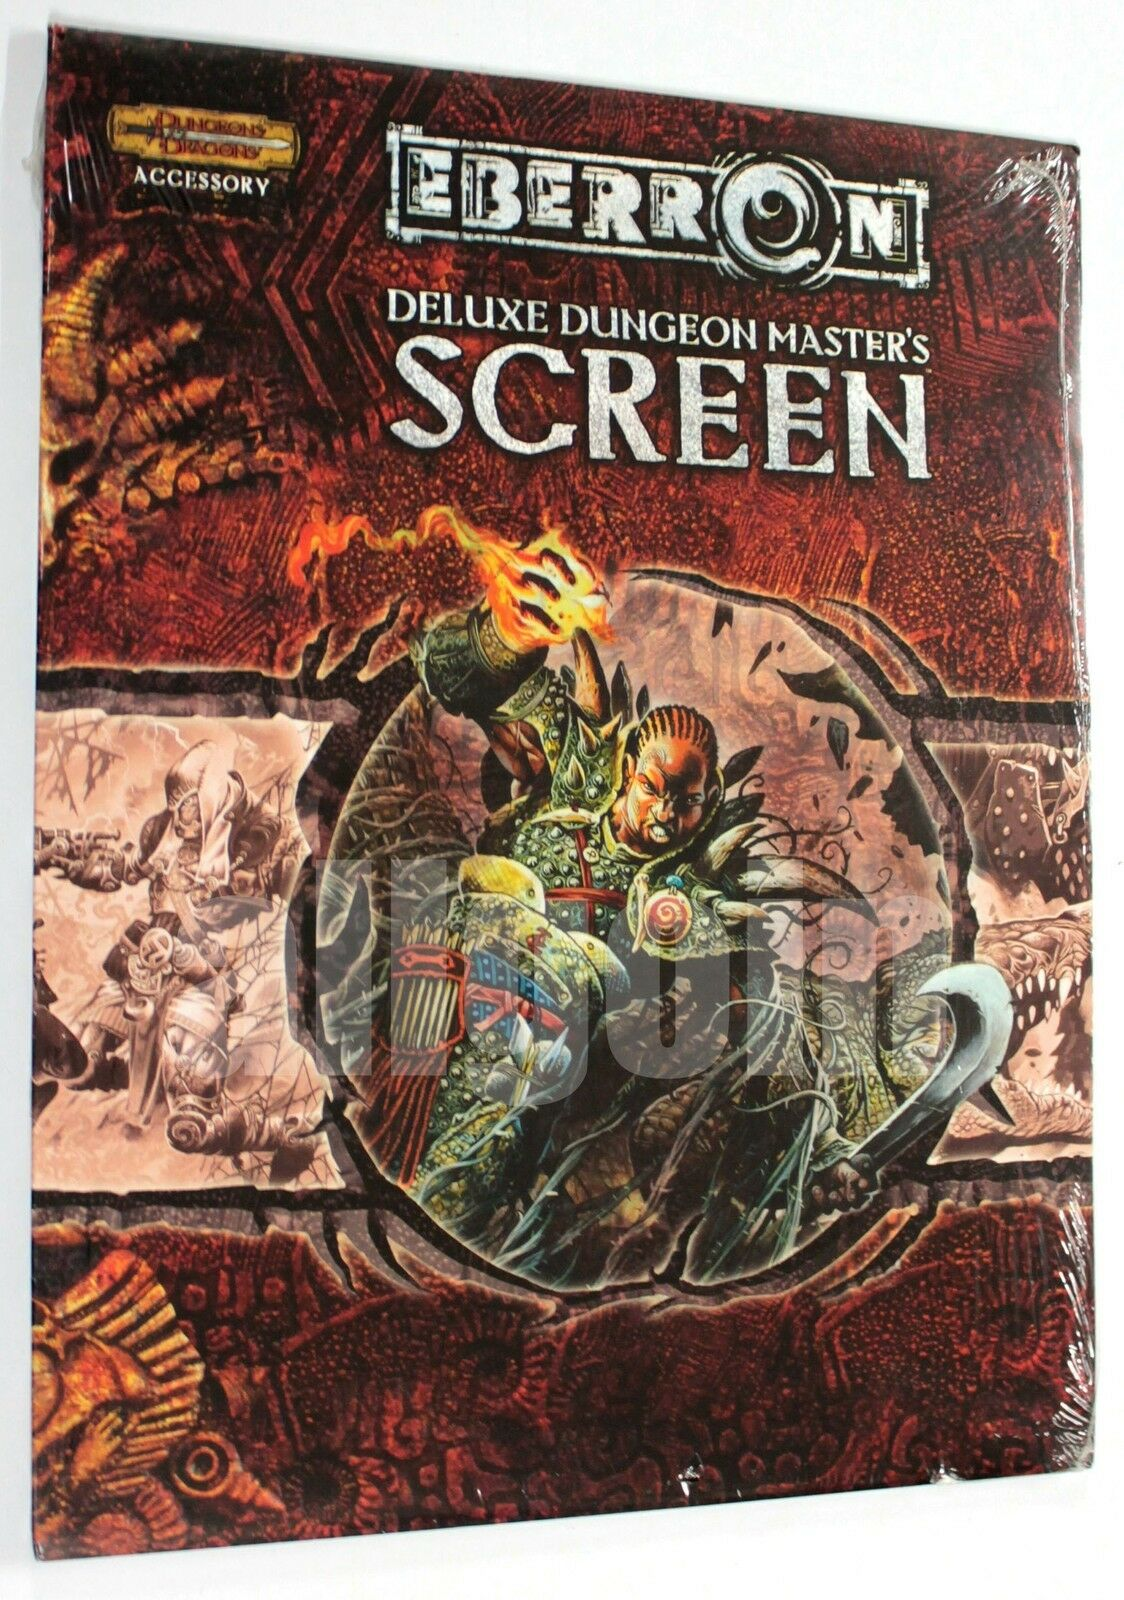 Dungeons & Dragons EBERRON DELUXE DUNGEON  MASTER'S SCREEN 2004 WOTC D&D 3.5 nuovo  vendita con alto sconto